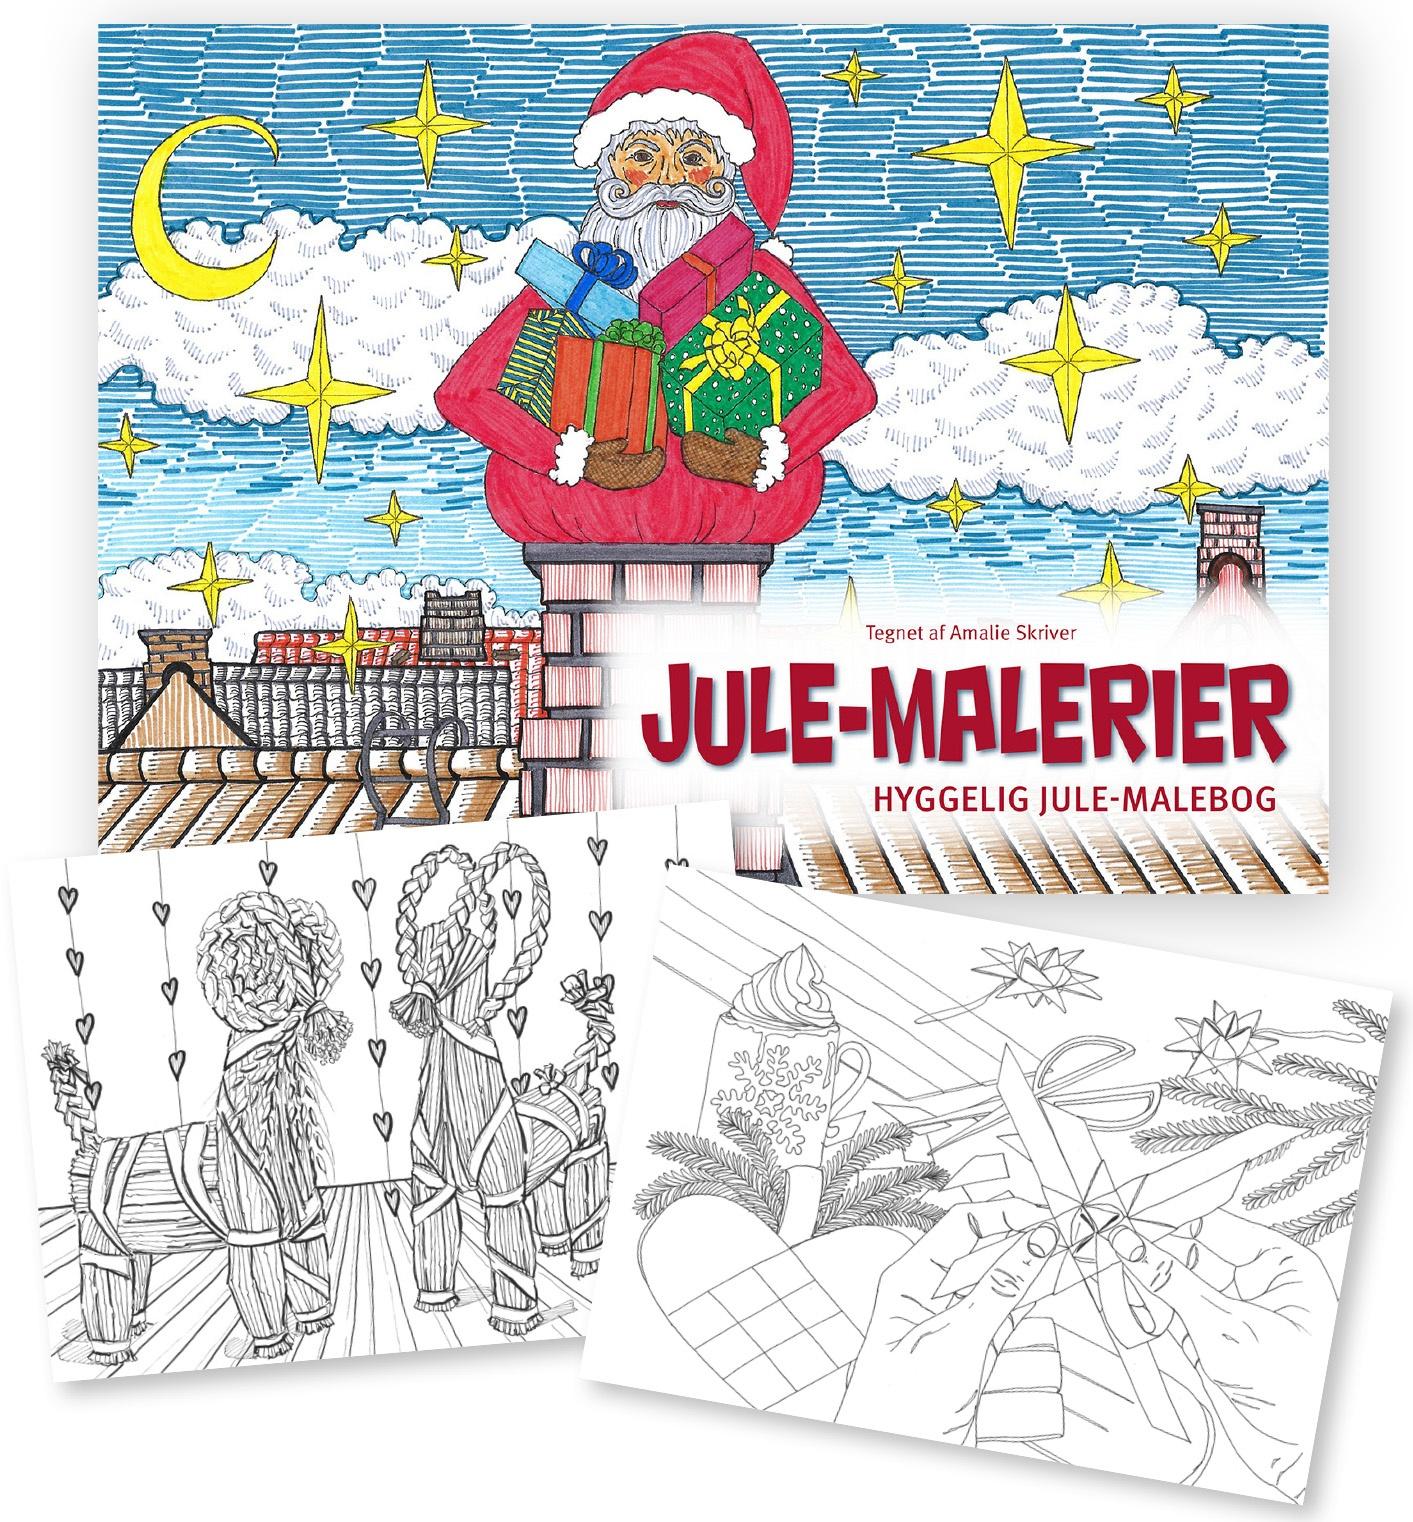 Image of Jule-malerier